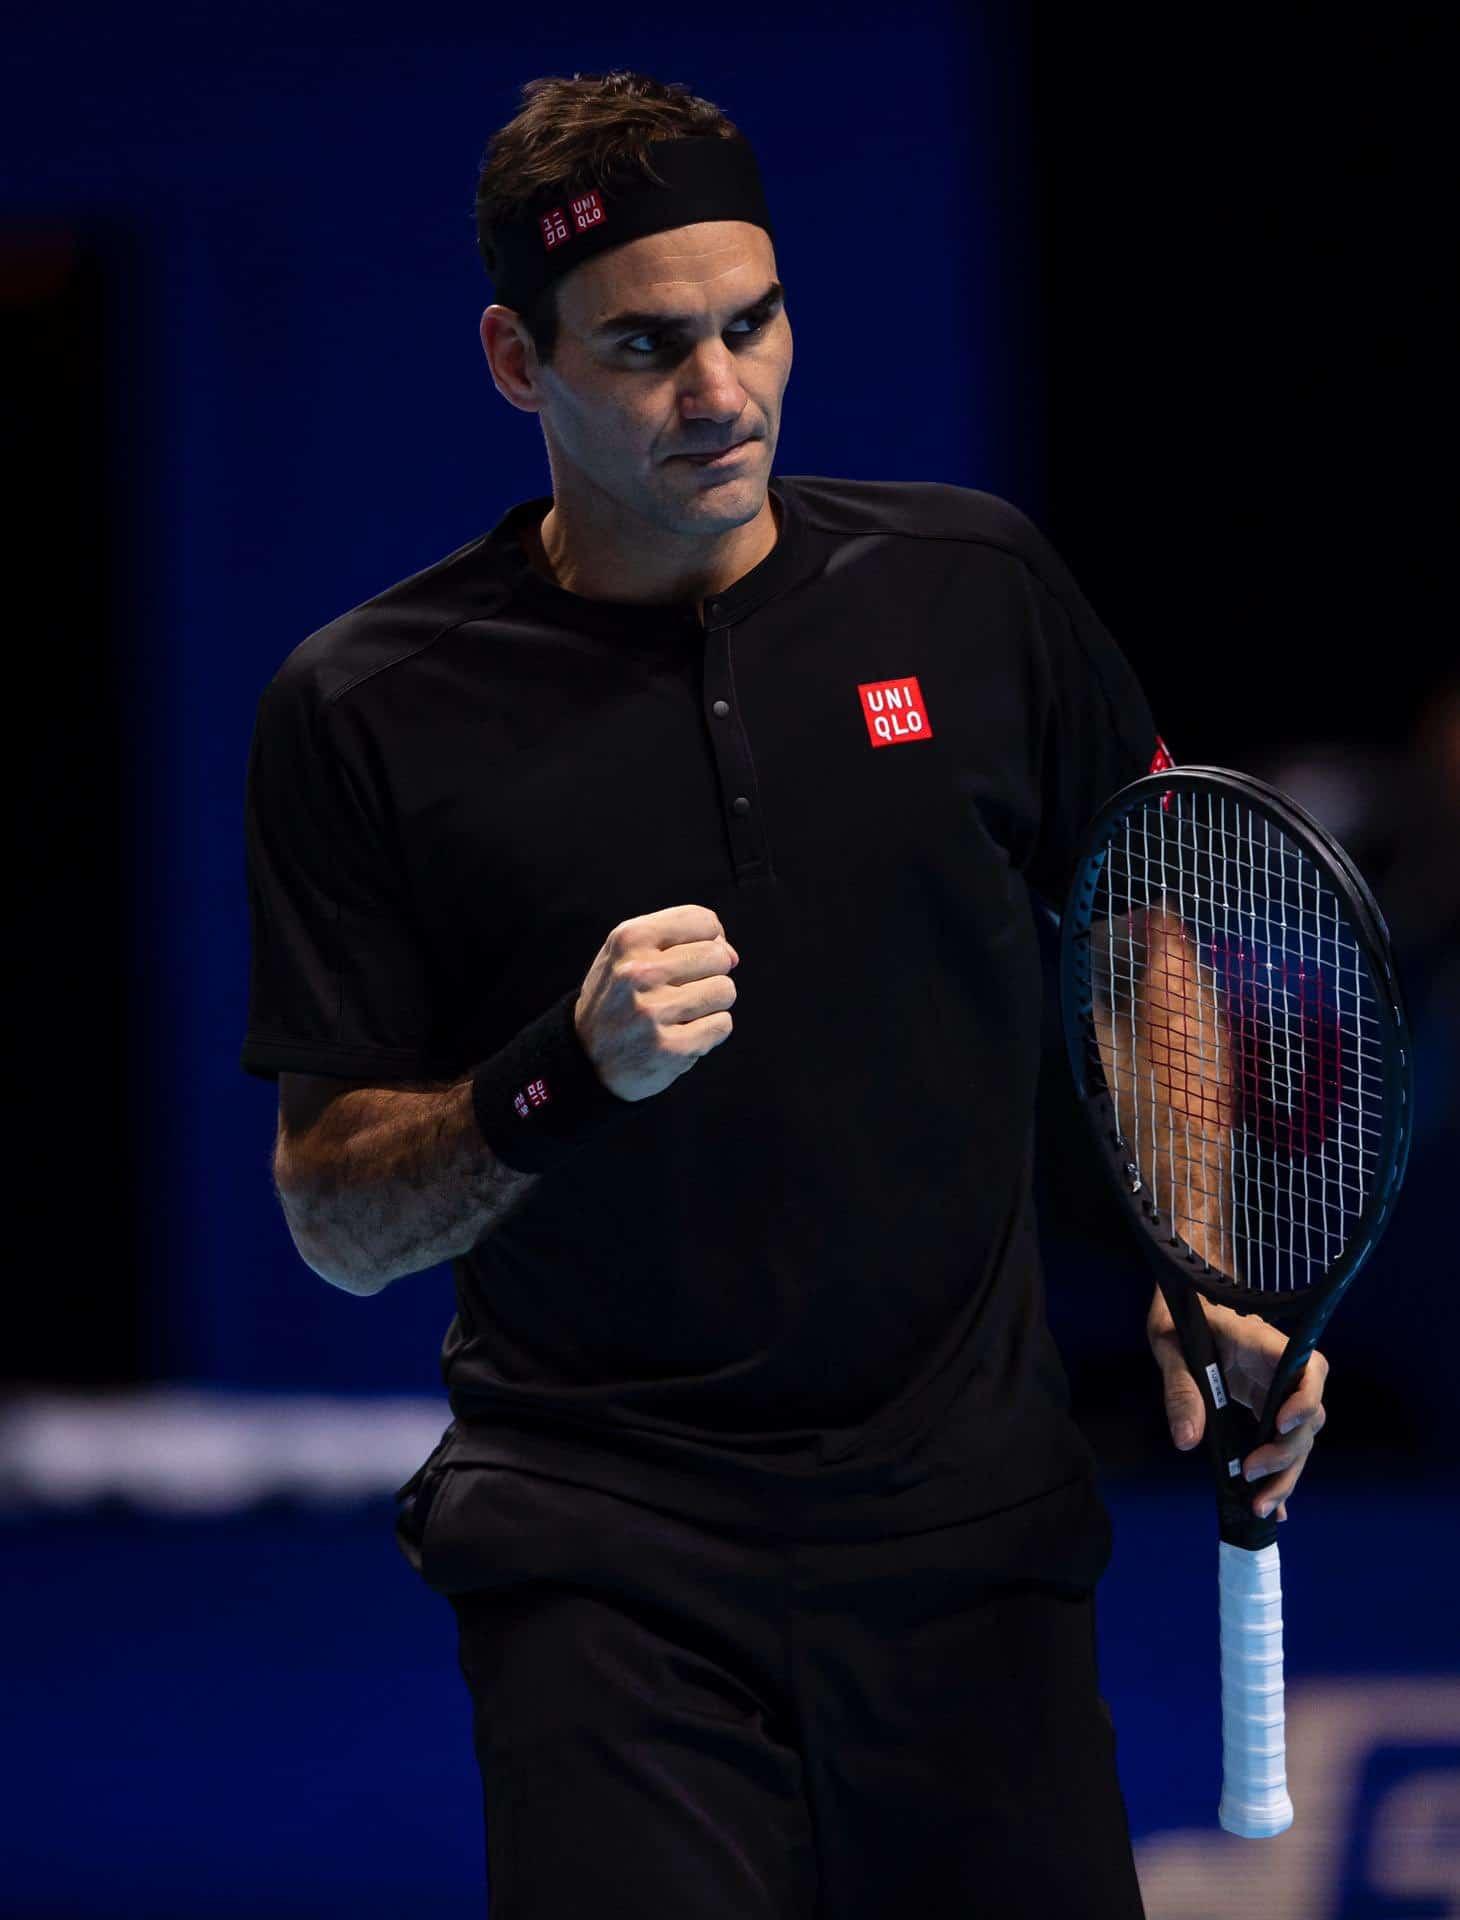 Federer Djokovic London 2019